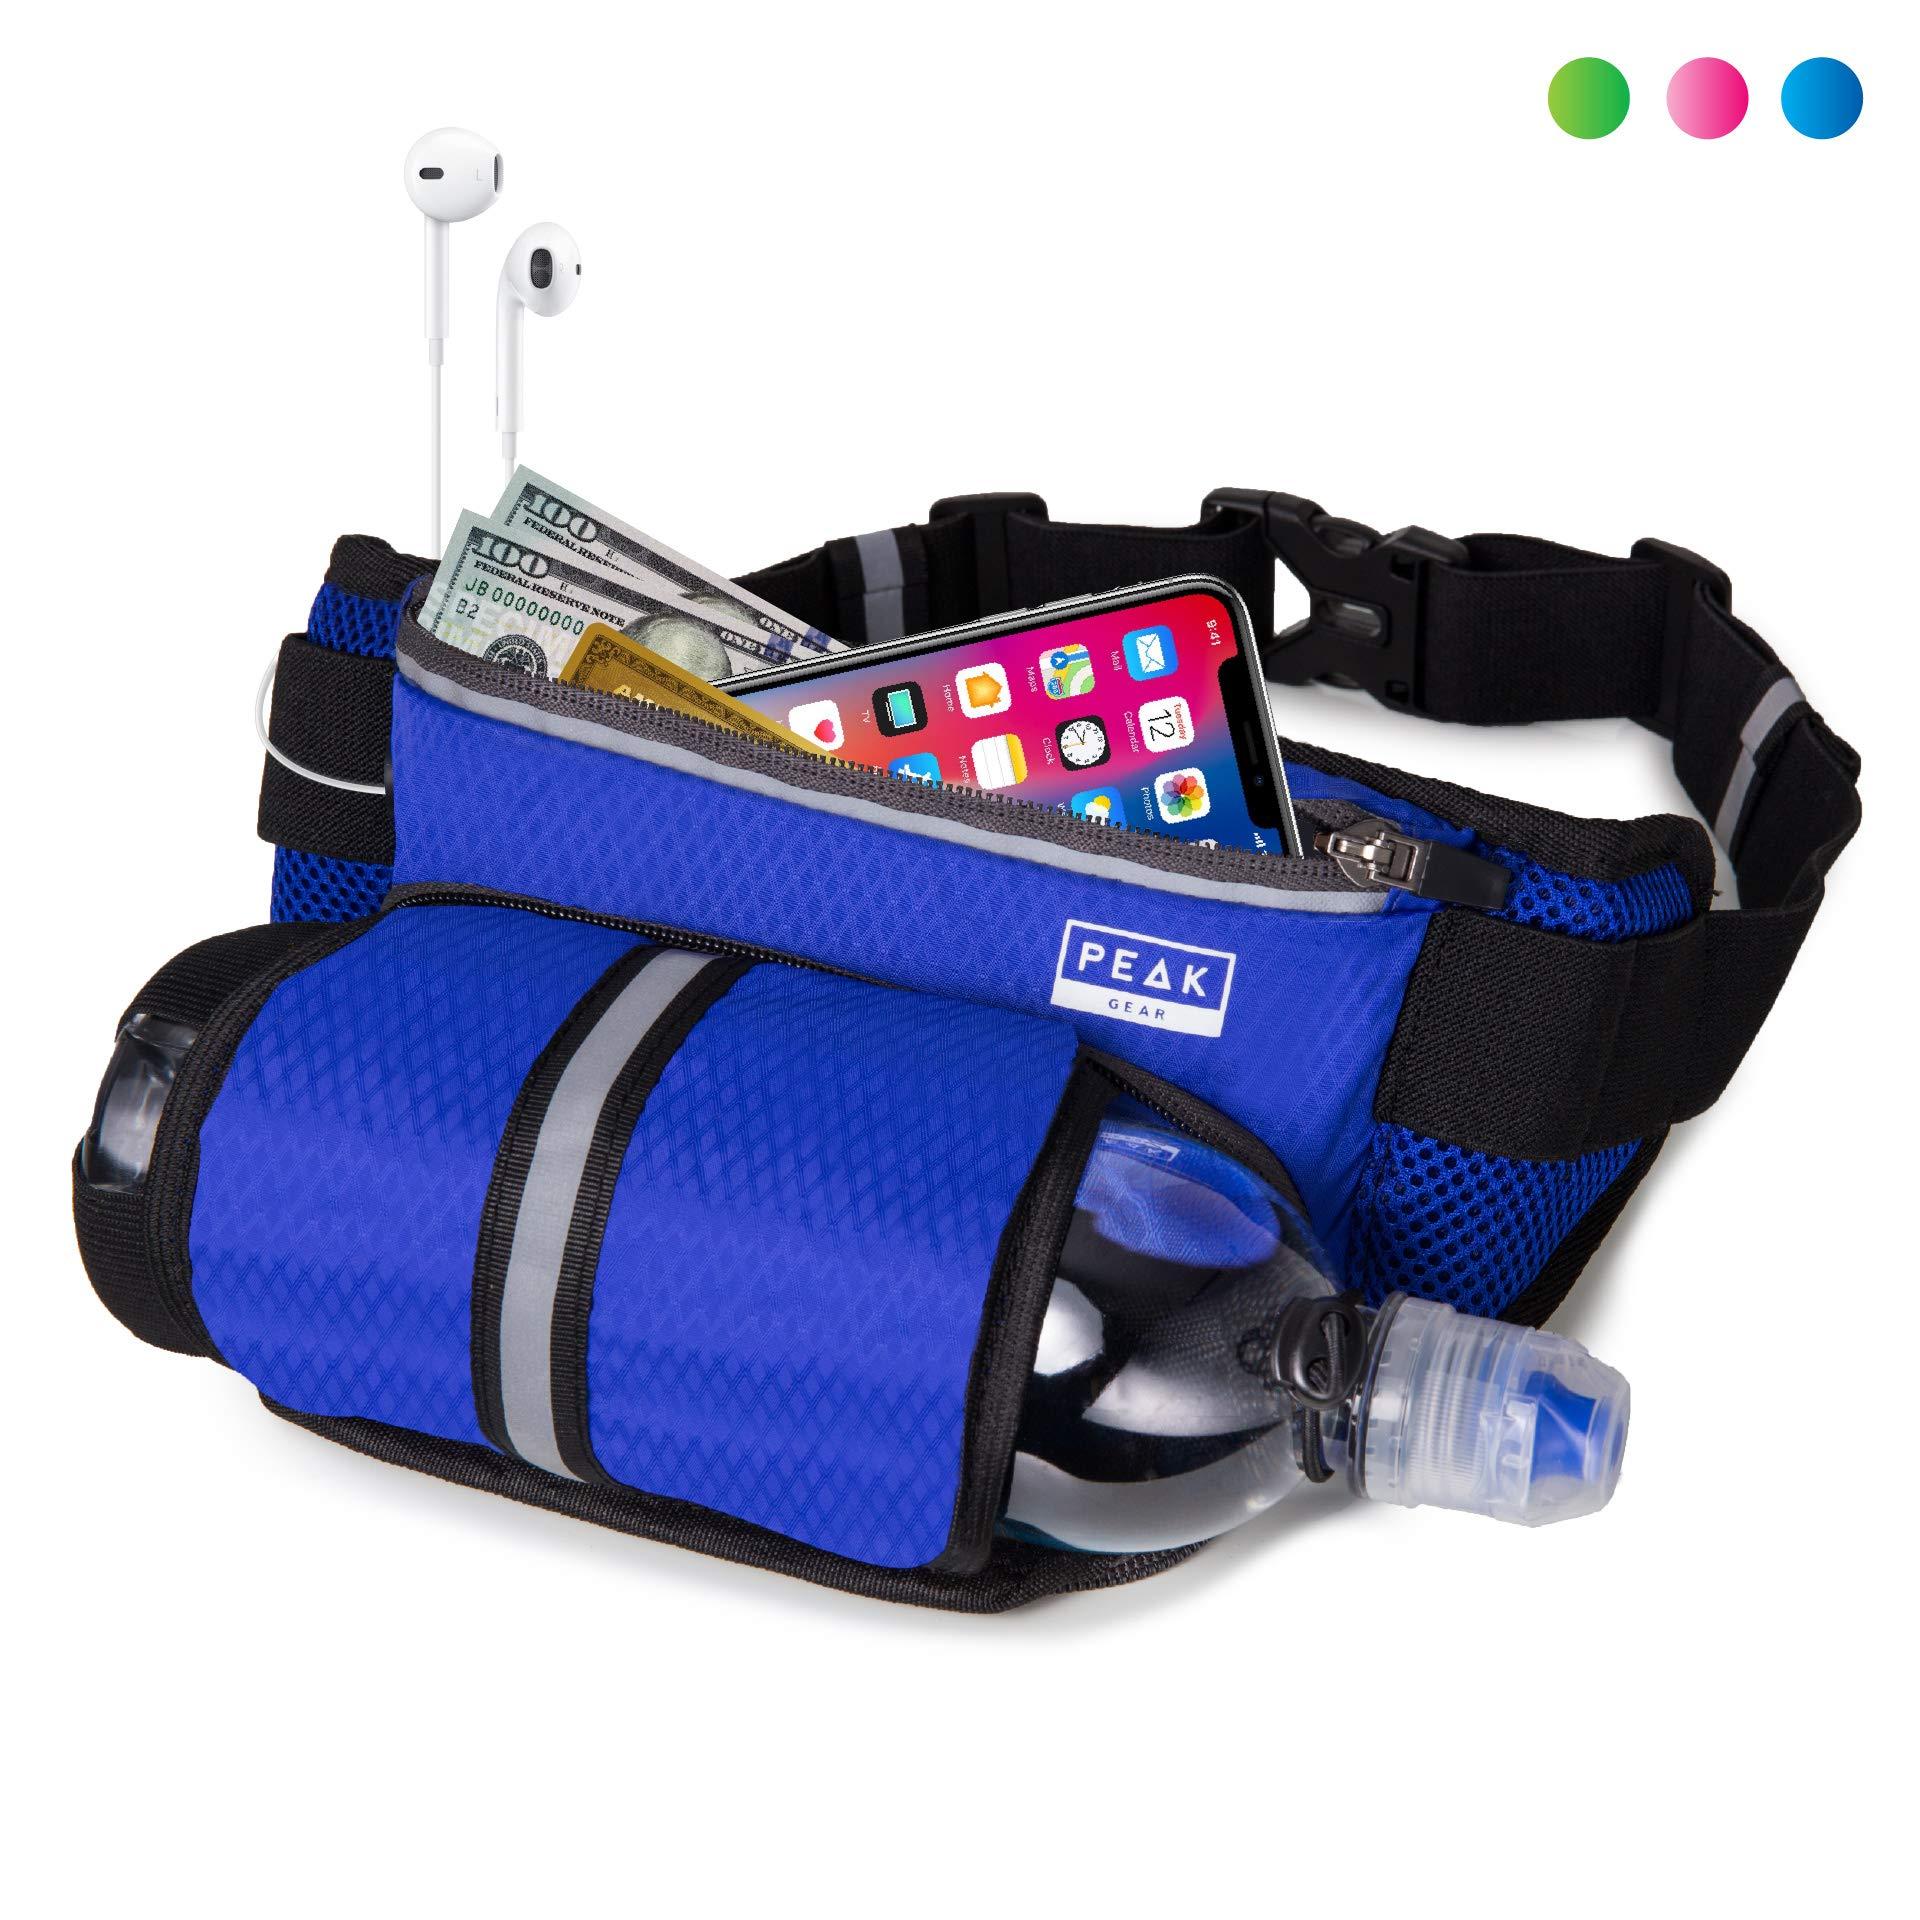 Peak Gear Waist Pack and Water Bottle Belt - New Larger Size - Hydration Fanny Pack for Jogging, Walking or Hiking (Blue) by Peak Gear